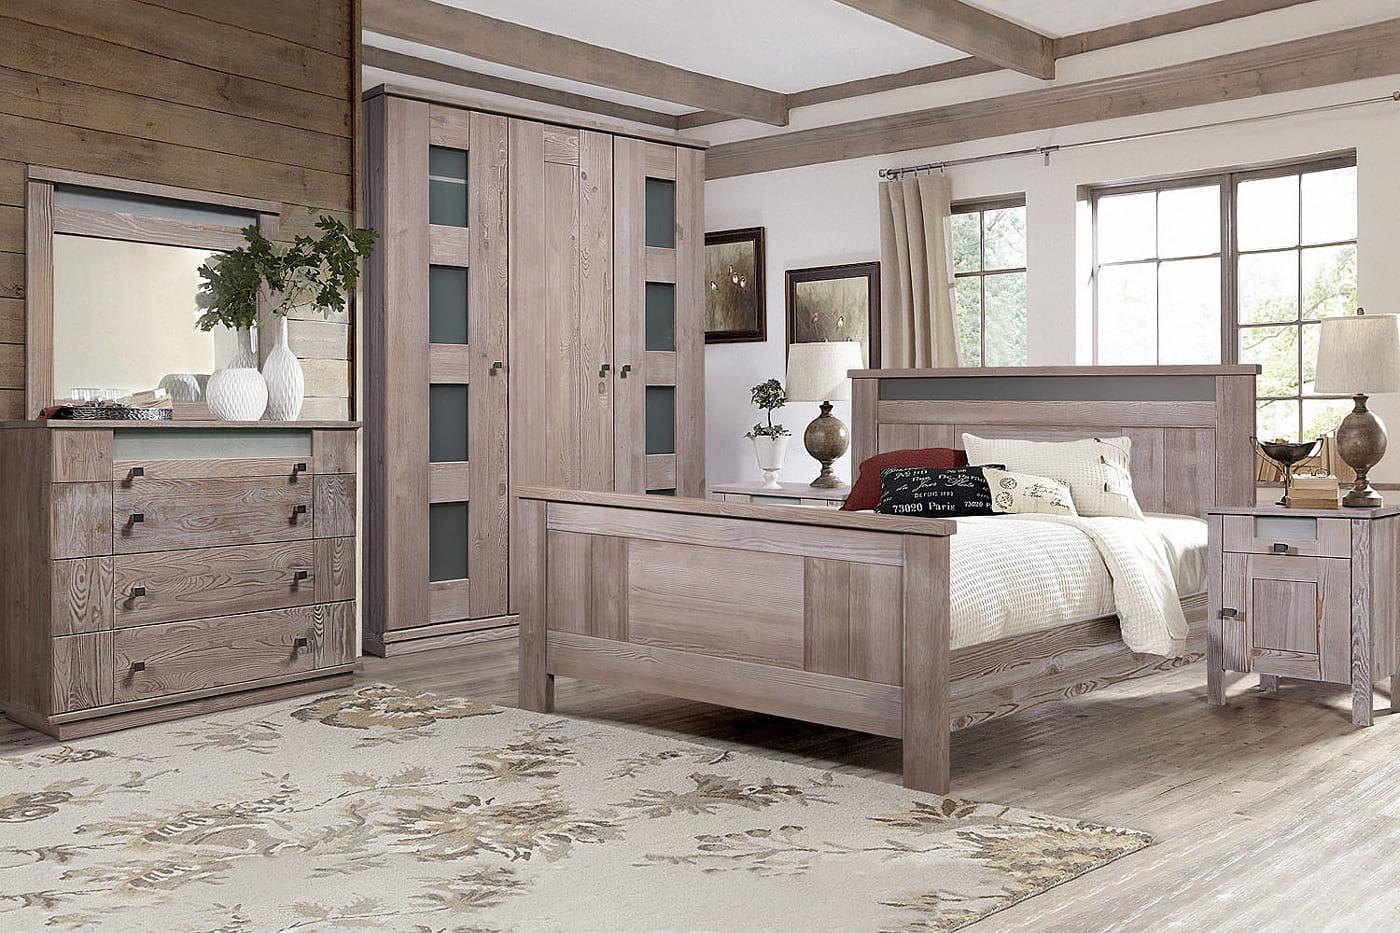 kiefer schlafzimmer komplett